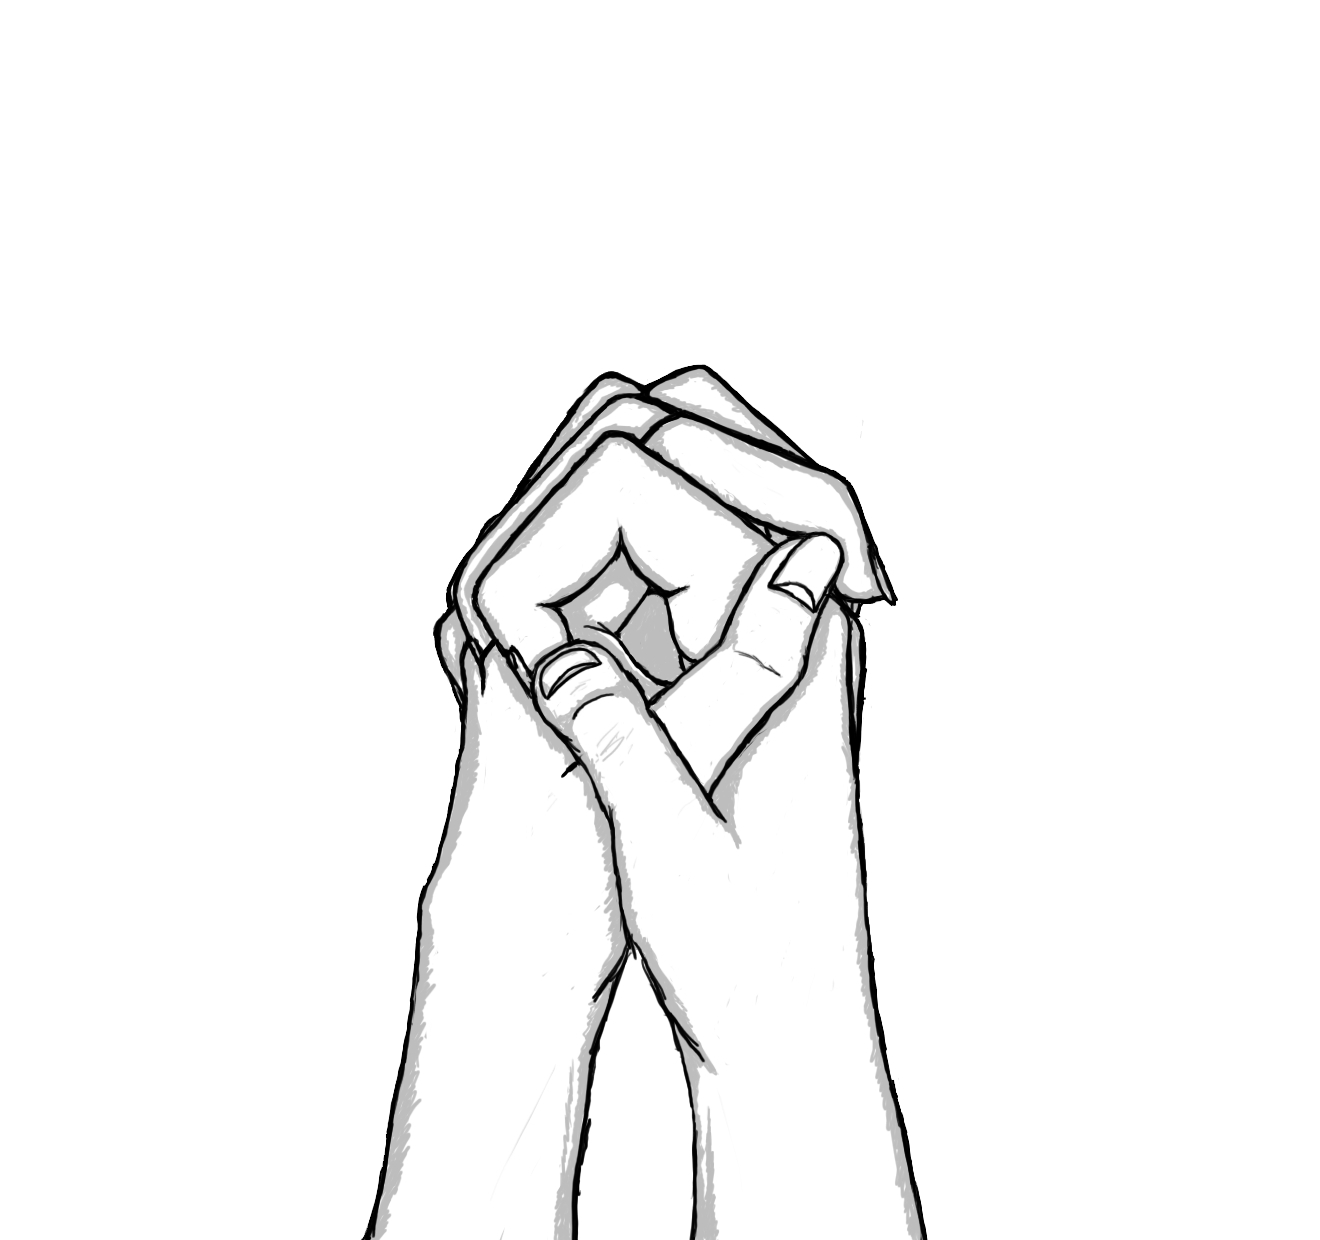 1320x1240 Simple Drawings Of People Drawings Of People In Love Holding